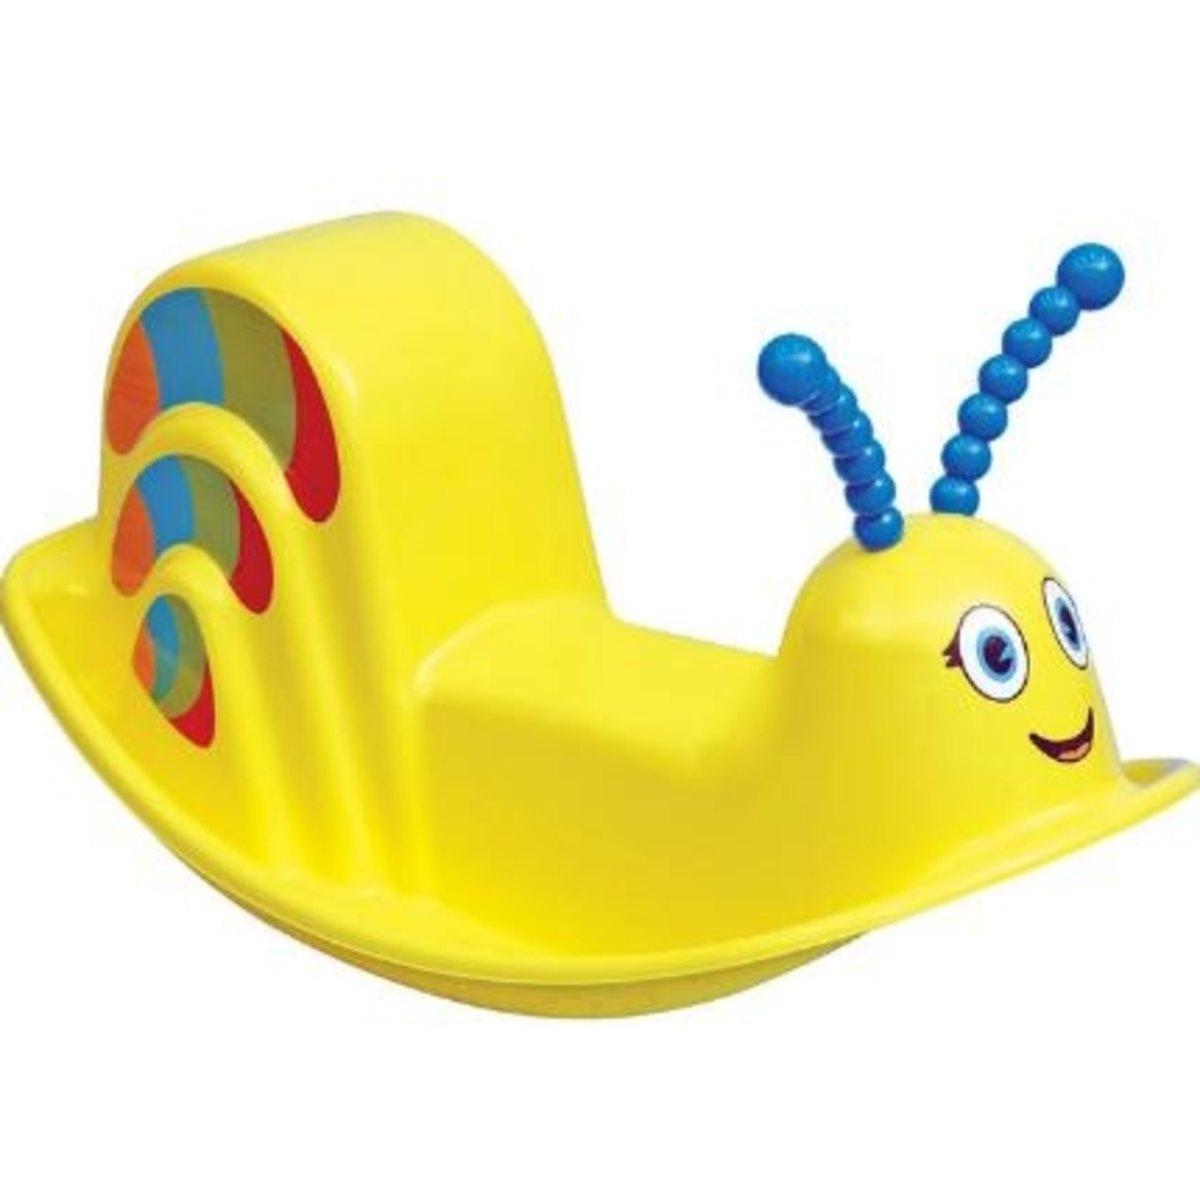 Balanço Plástico Tramontina Infantil Dindon Amarelo